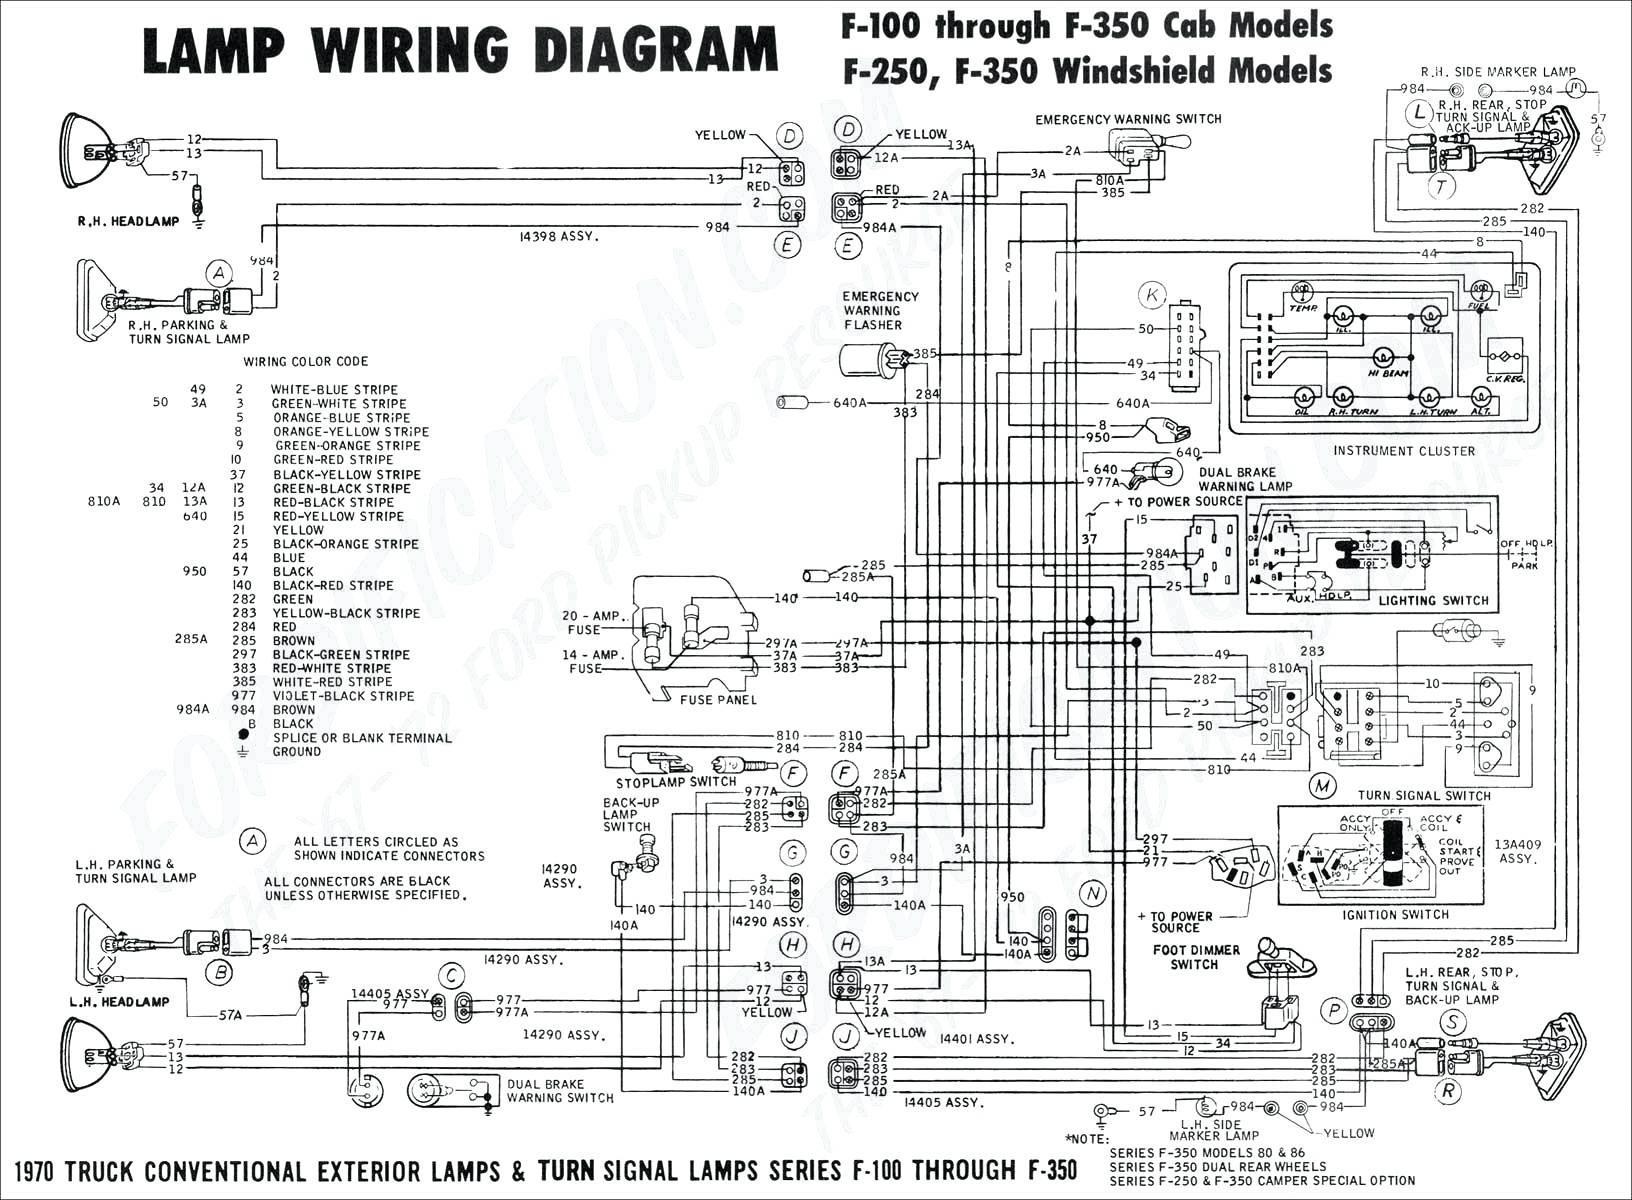 1998 ford Explorer Engine Diagram ford Explorer Relay Diagram – Simple Wiring Diagram Of 1998 ford Explorer Engine Diagram